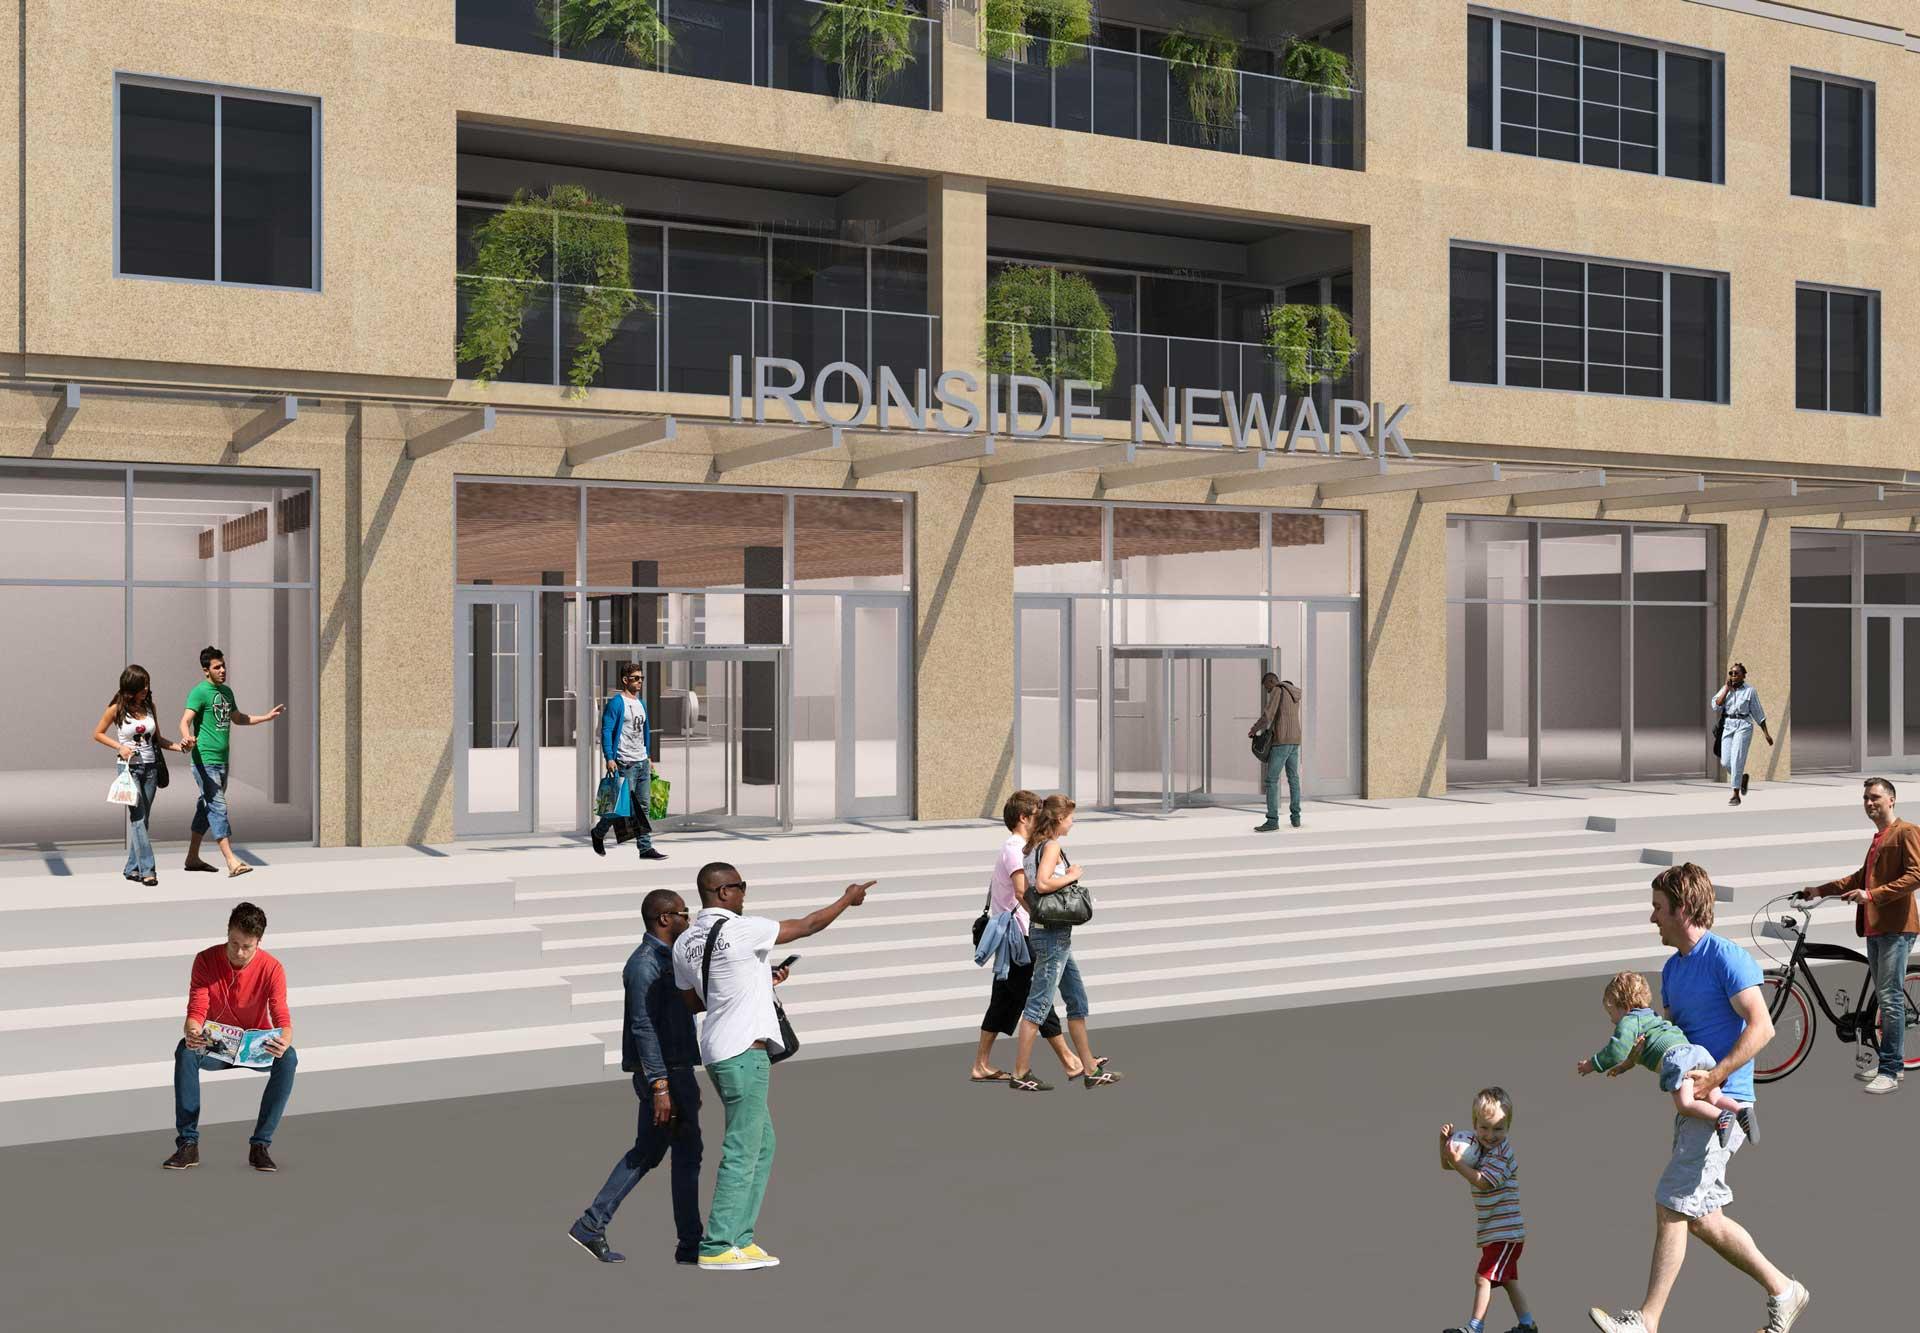 Ironside Warehouse Newark New Jersey Elevation 1 Providing Facade improvements